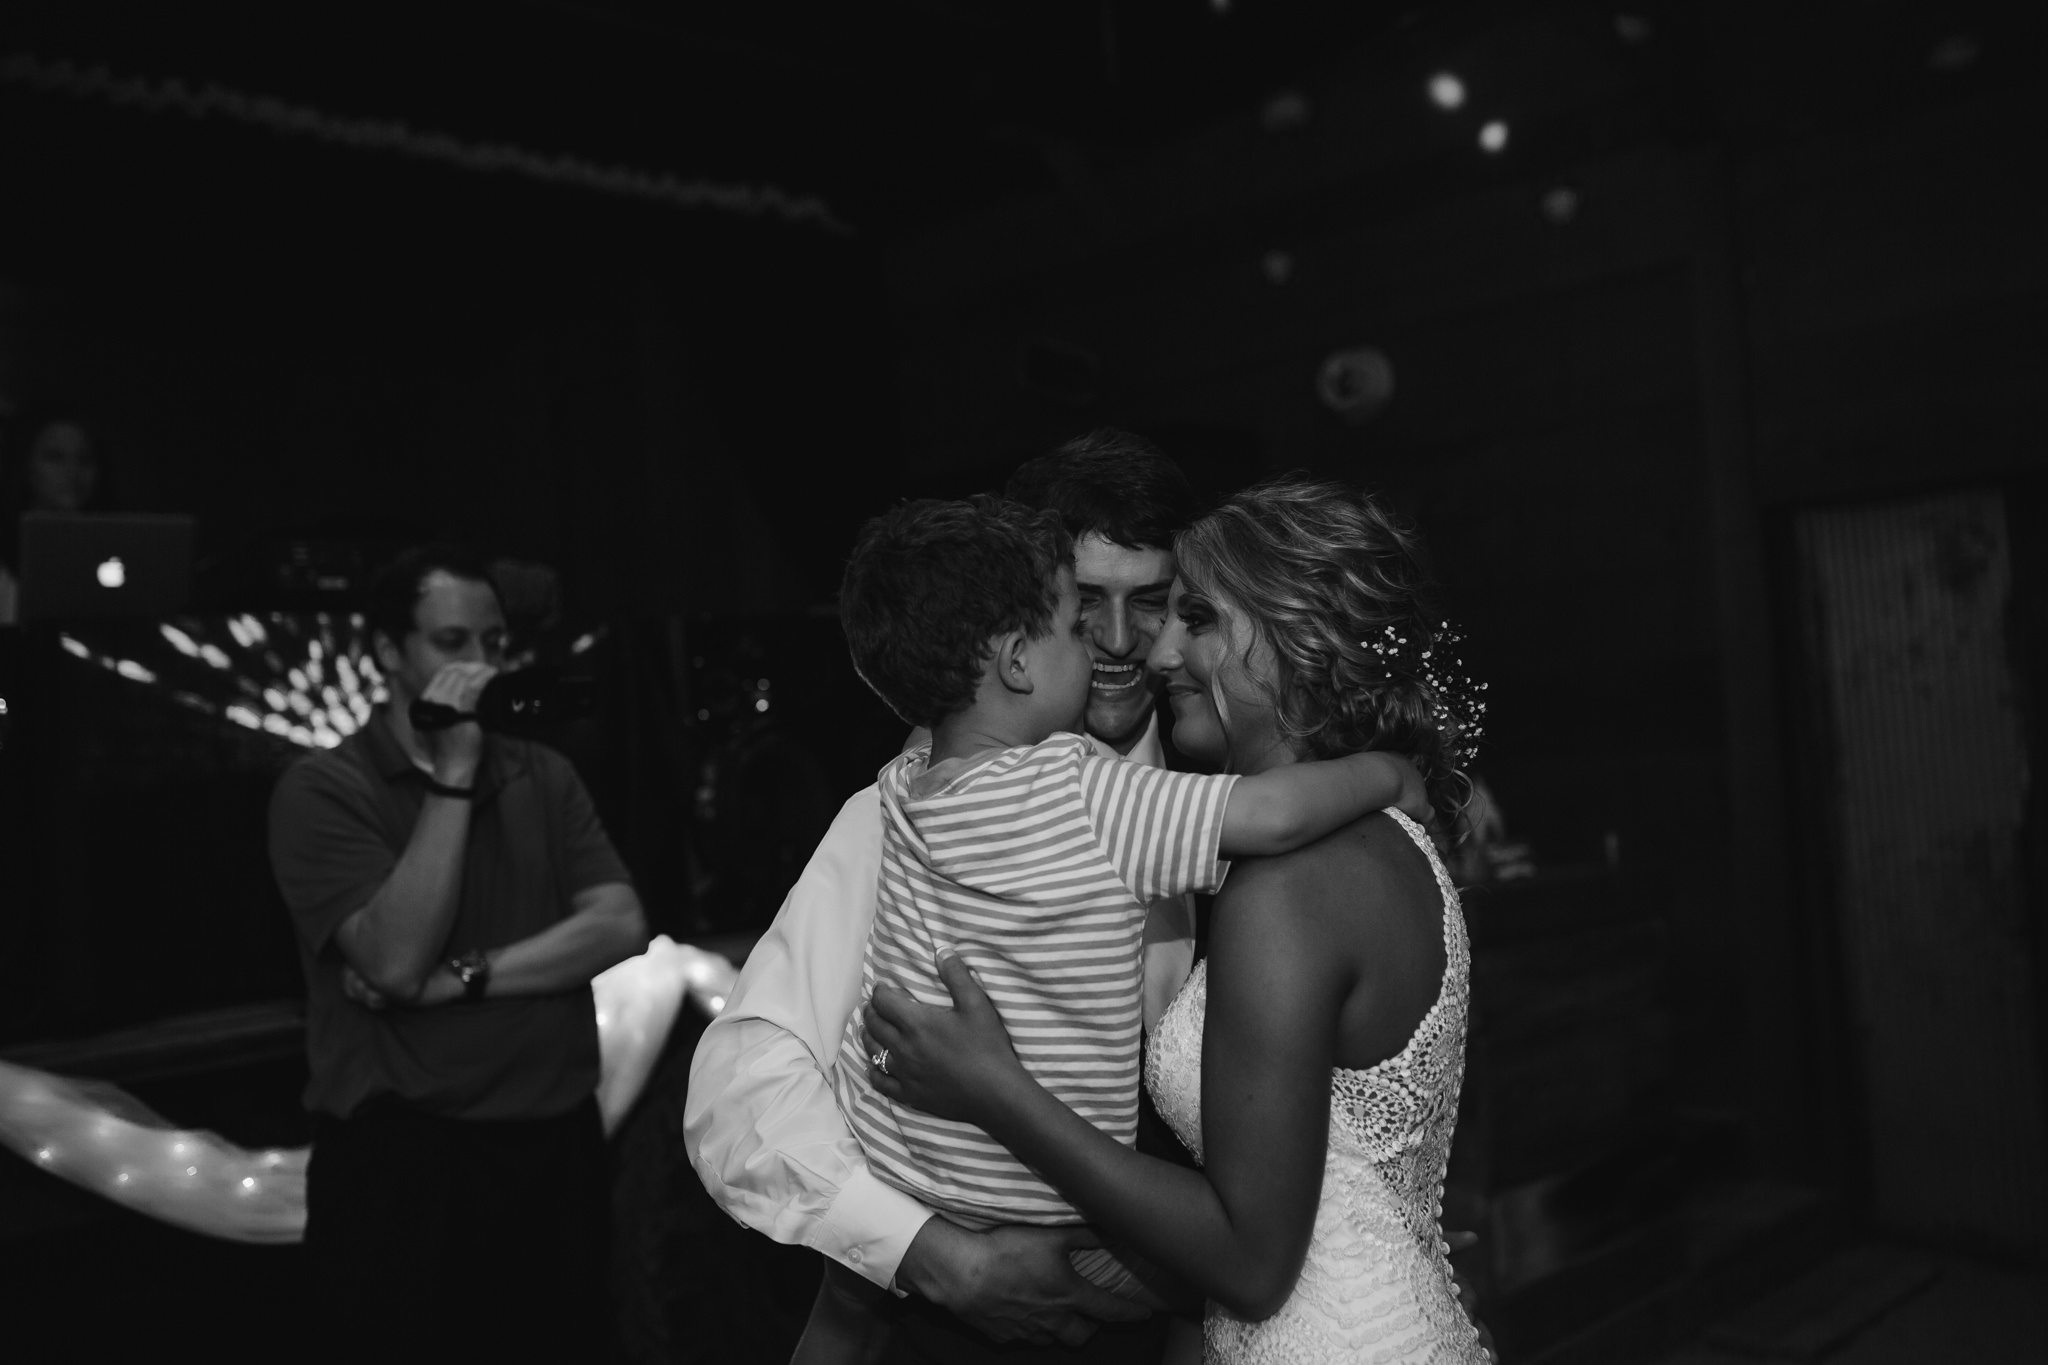 cassie-cook-photography-memphis-wedding-photographer-the-chapel-at-plein-air-sneed-wedding-55.jpg